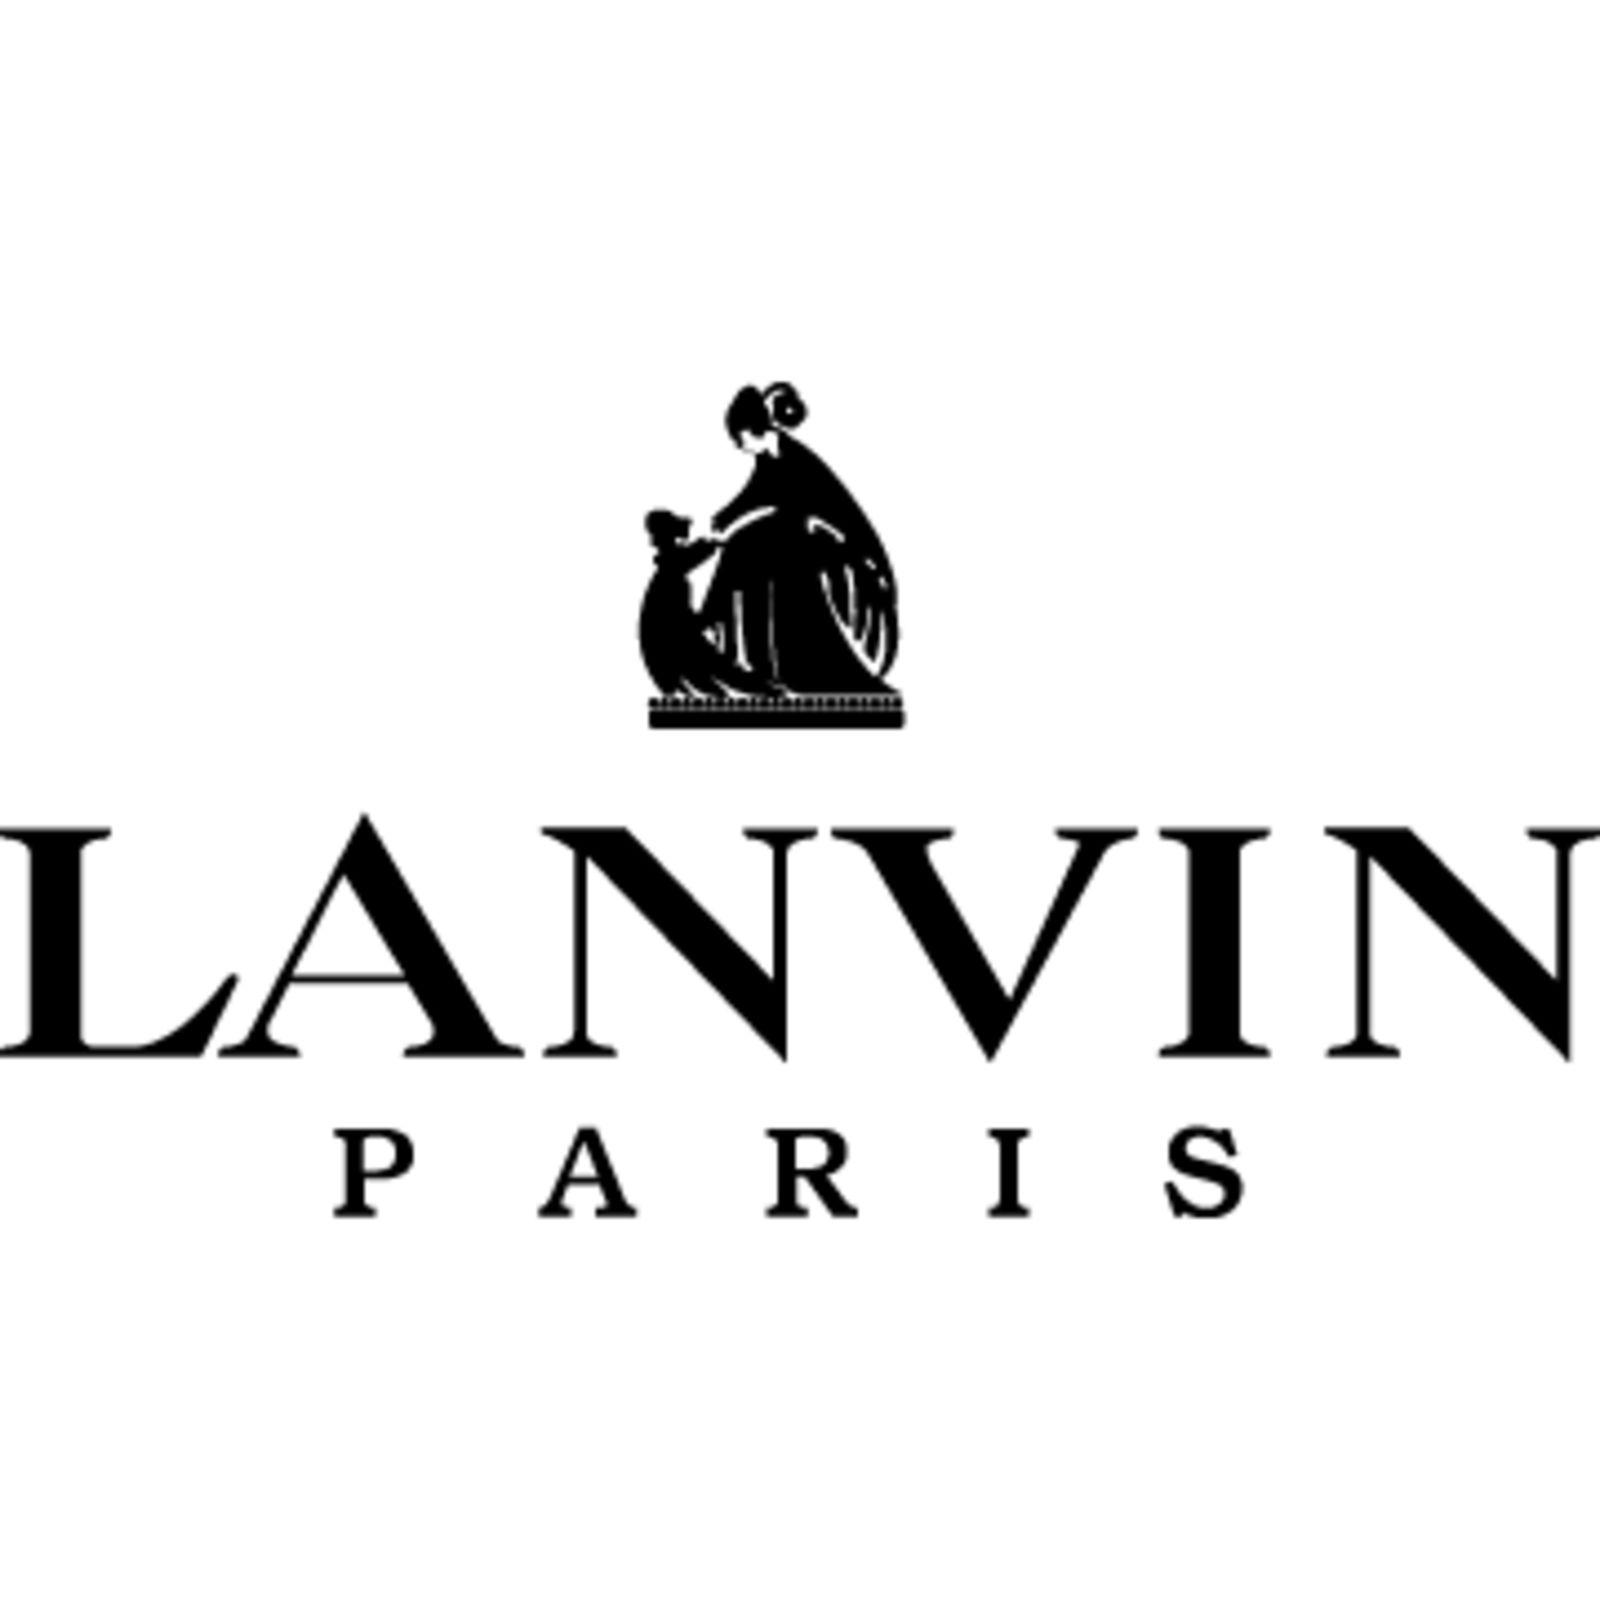 LANVIN (Image 1)